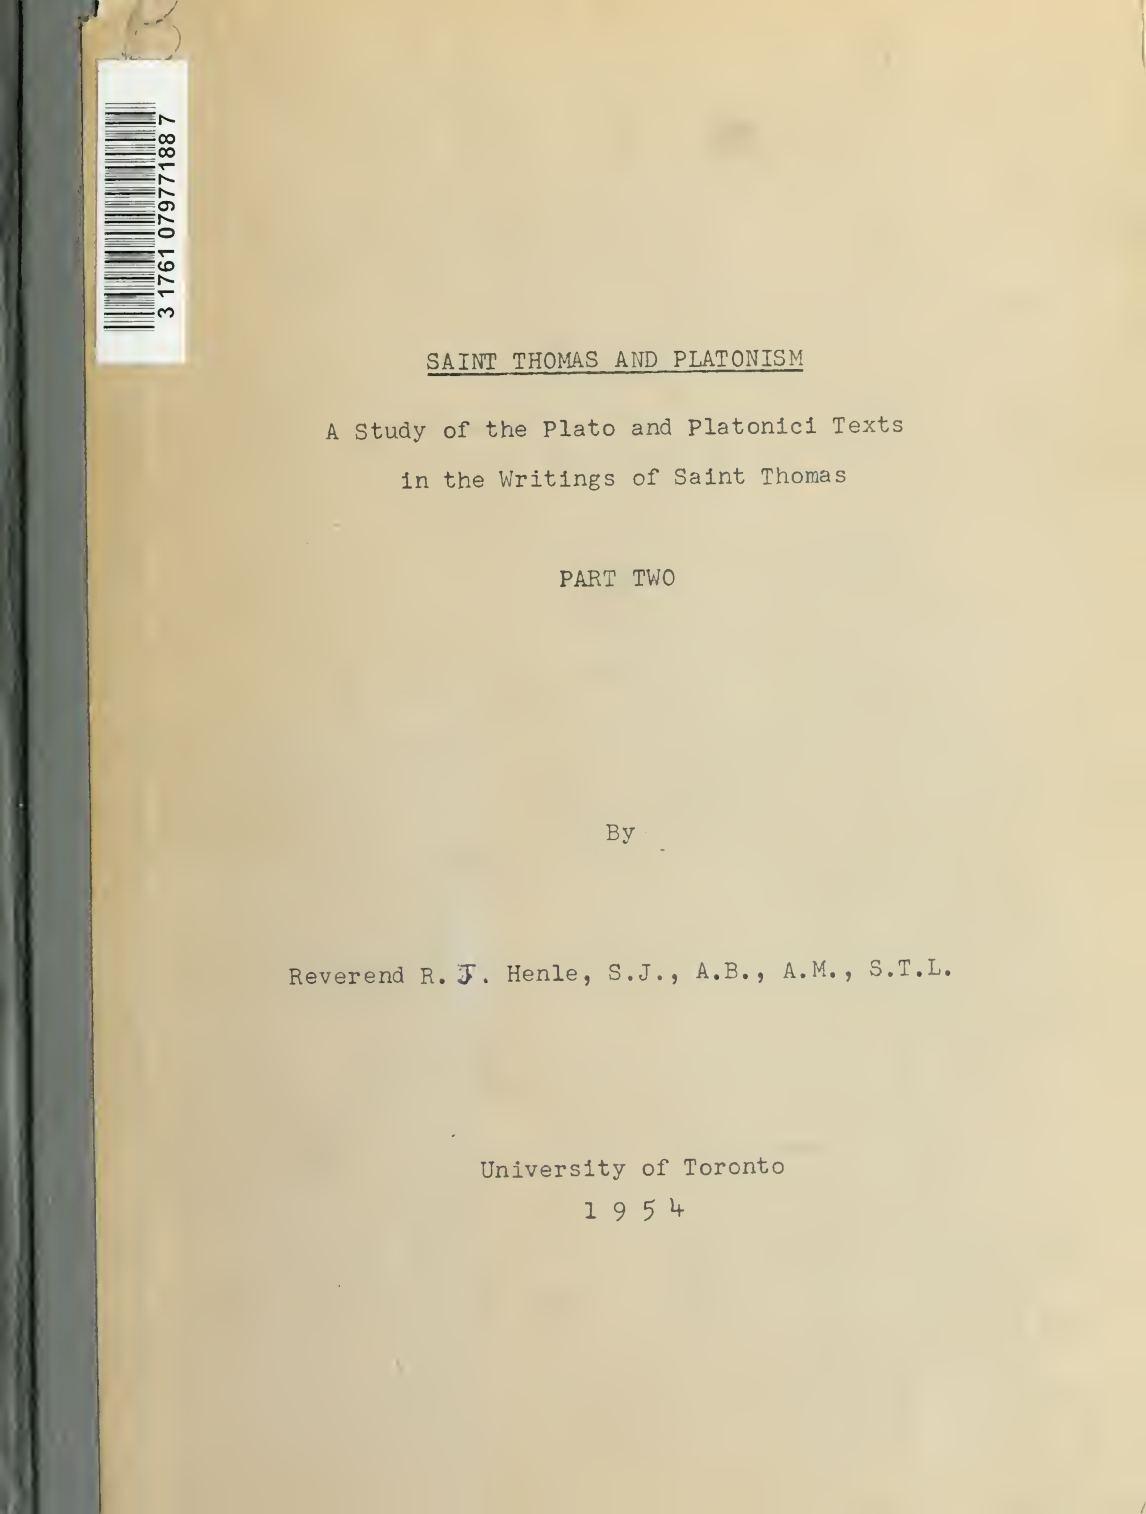 Calaméo Saint Thomas and Platonism A Study of the Plato